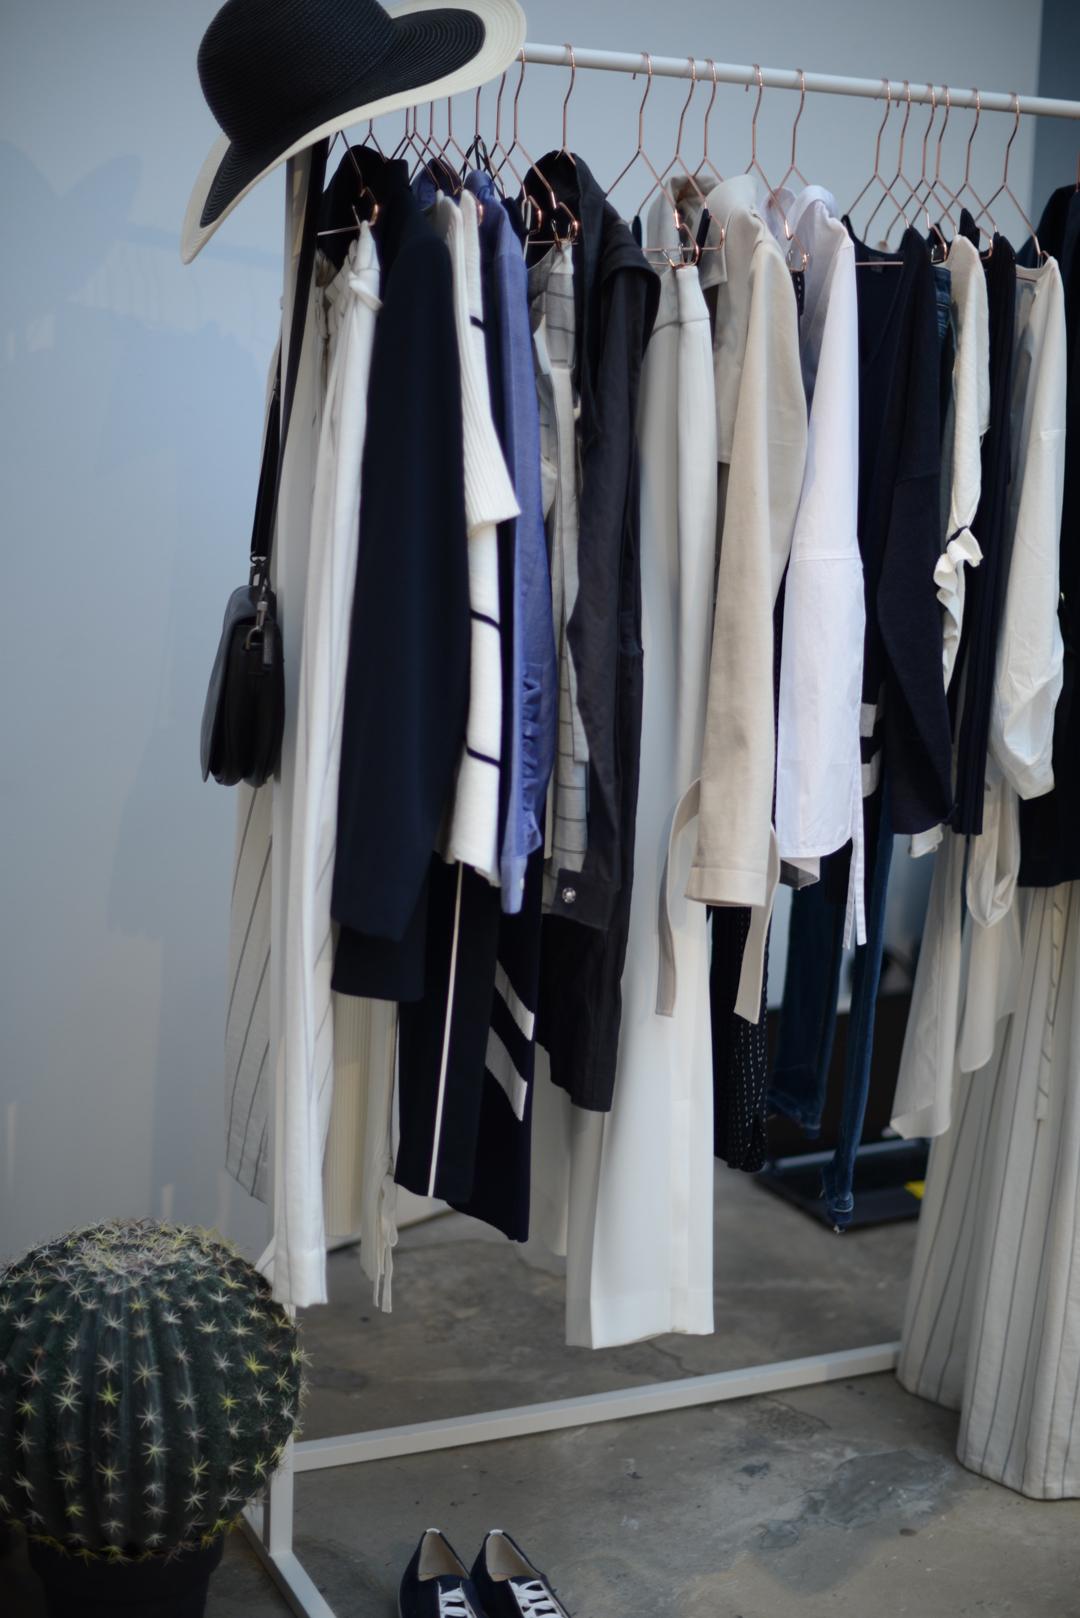 5 closet detox tips by stylist and fashion blogger sara delaney